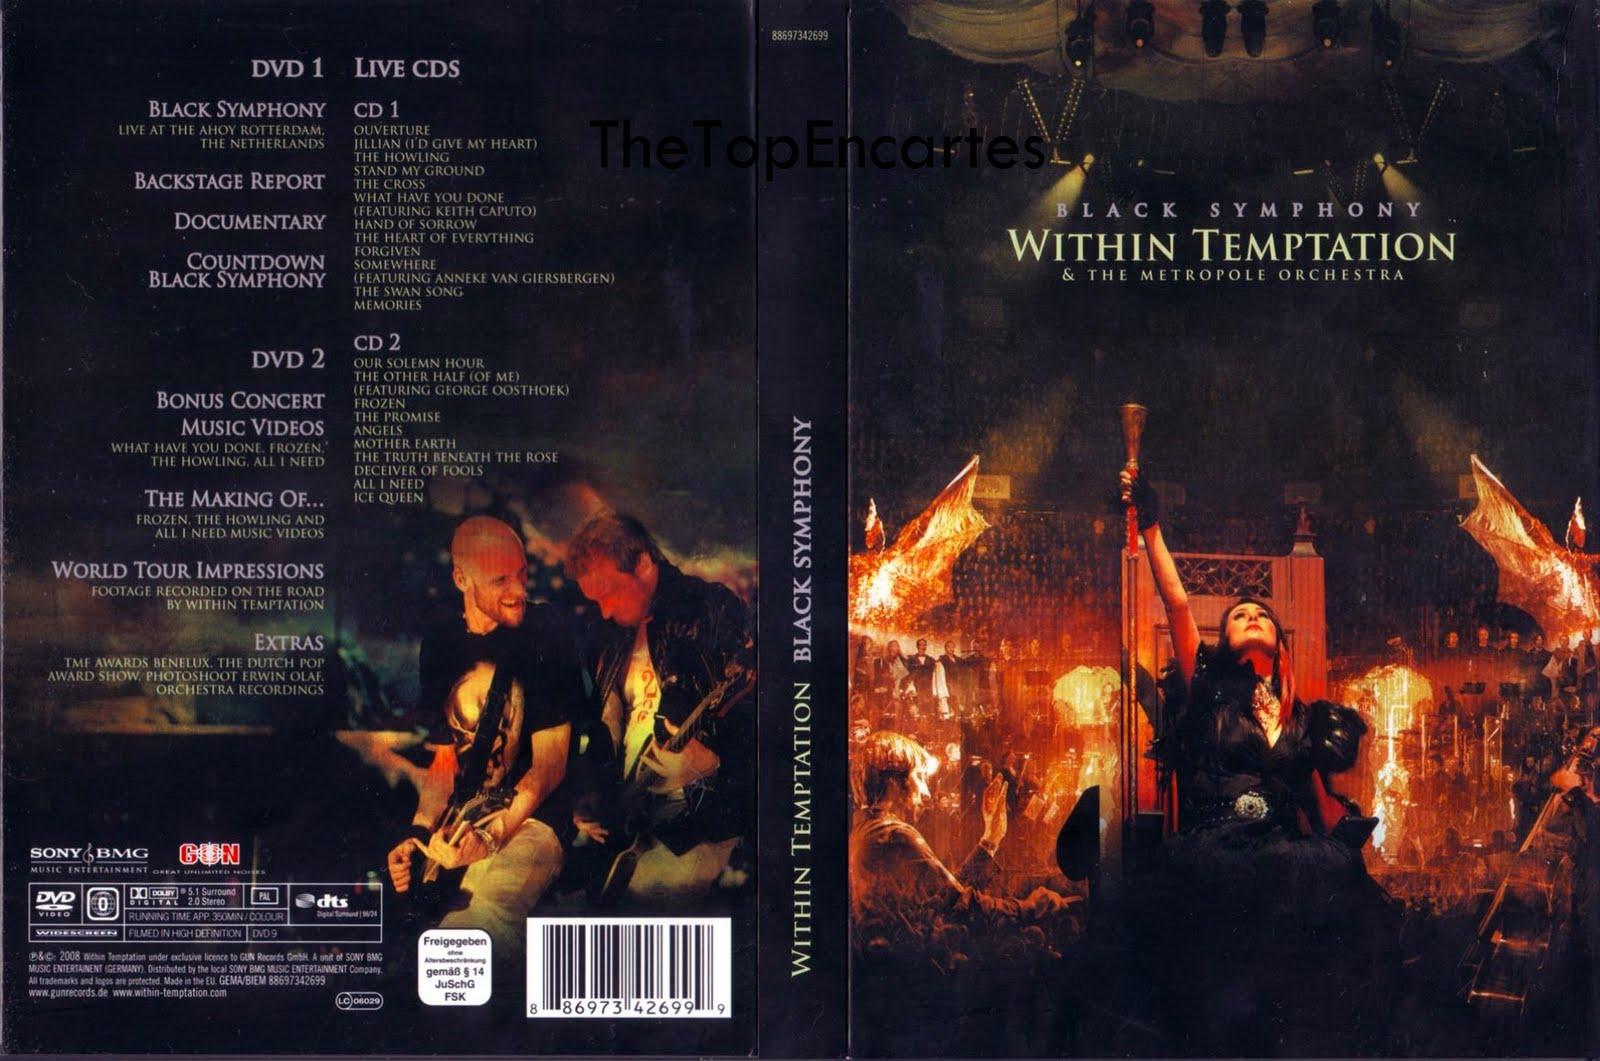 http://2.bp.blogspot.com/-hBXYdjSff0o/TlOsKzk5E4I/AAAAAAAADrE/RZsoXHpg4Ls/s1600/Within_Temptation___The_Metropole_Orchestra___Black_Symphony-10070126032009.jpg